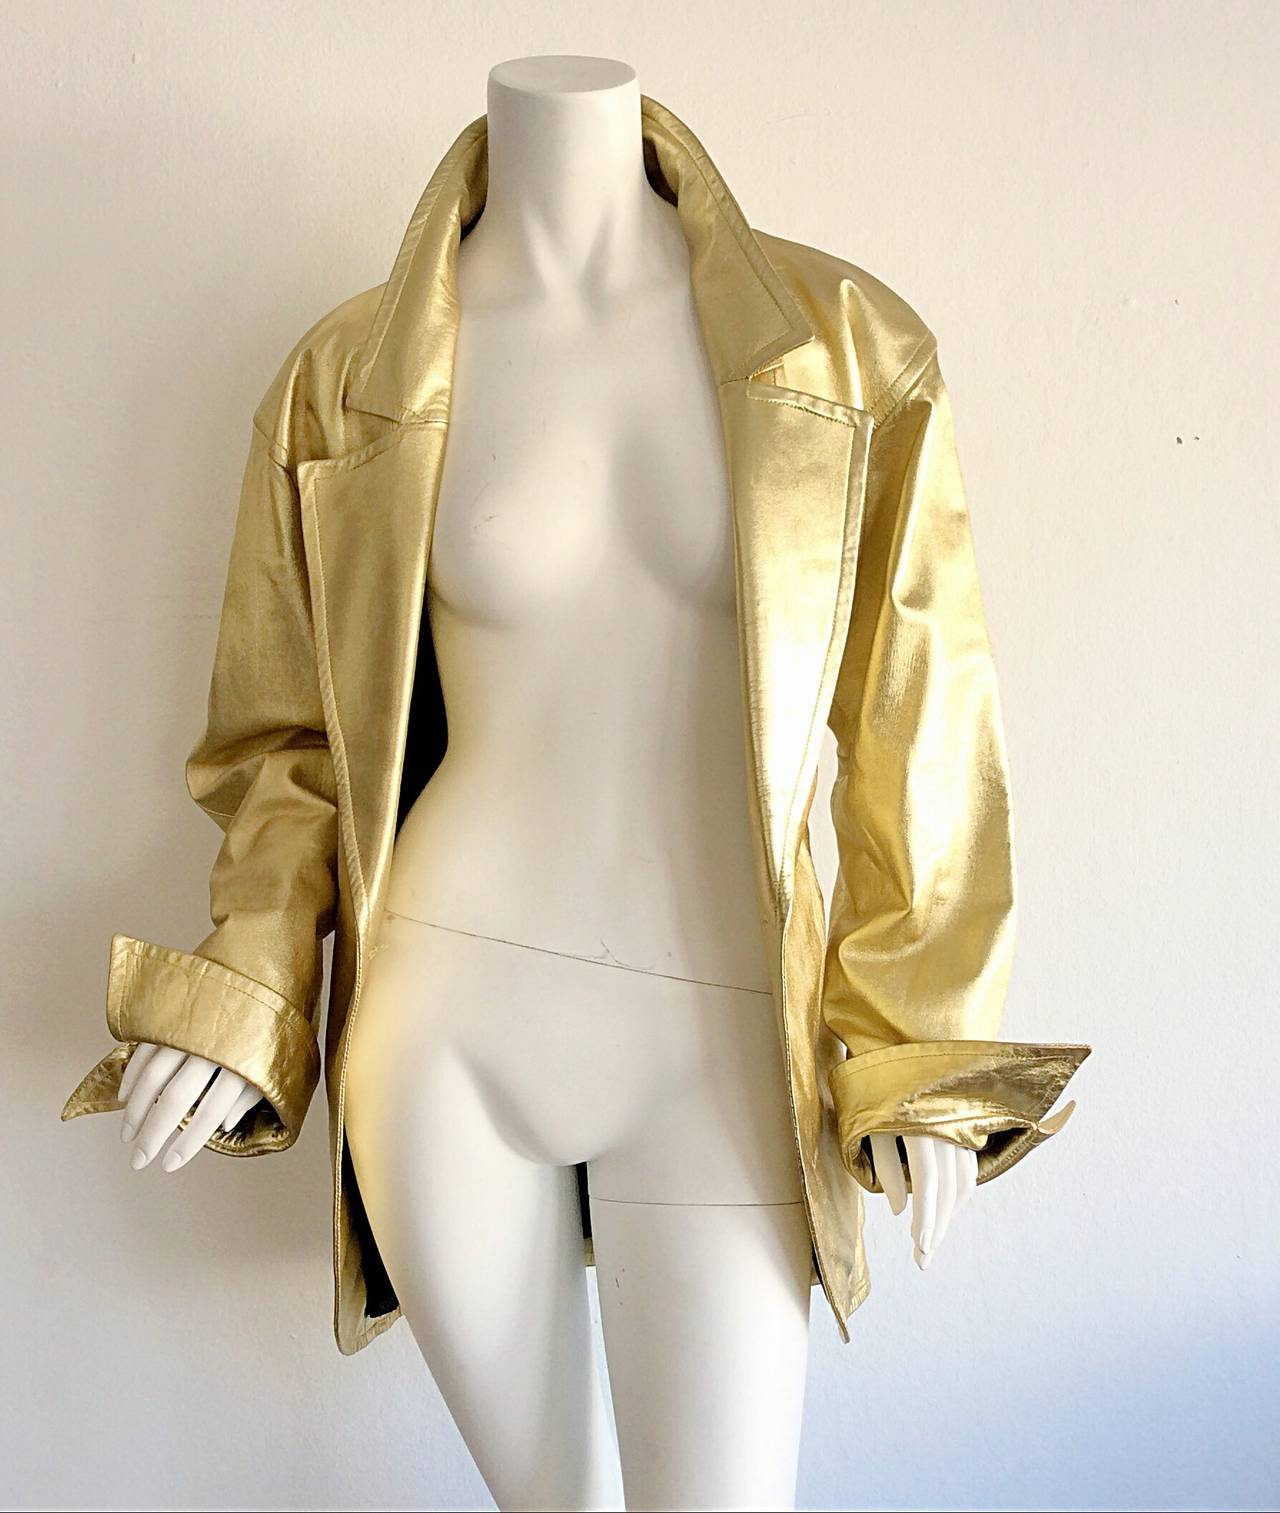 Vintage Yves Saint Laurent ' Rive Gauche ' Belted Gold Leather Jacket 4